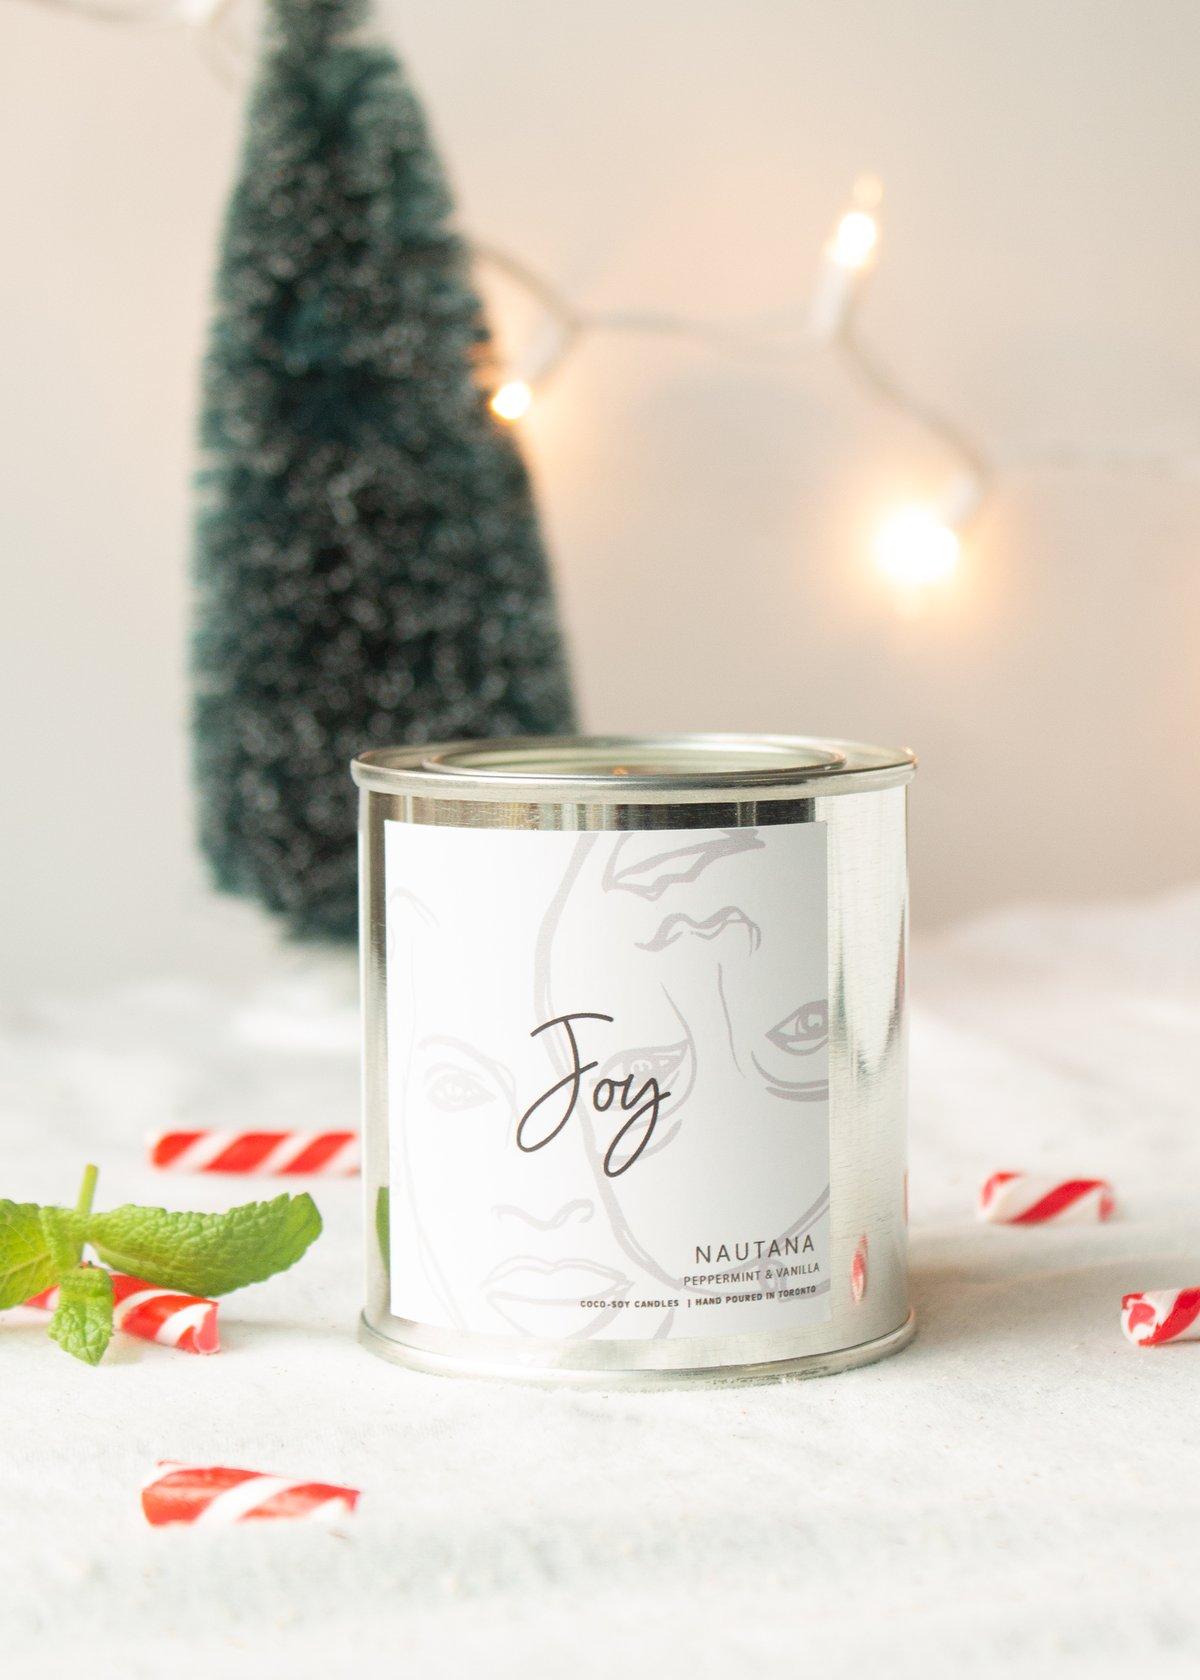 Image of Joy - Peppermint & Vanilla Candle